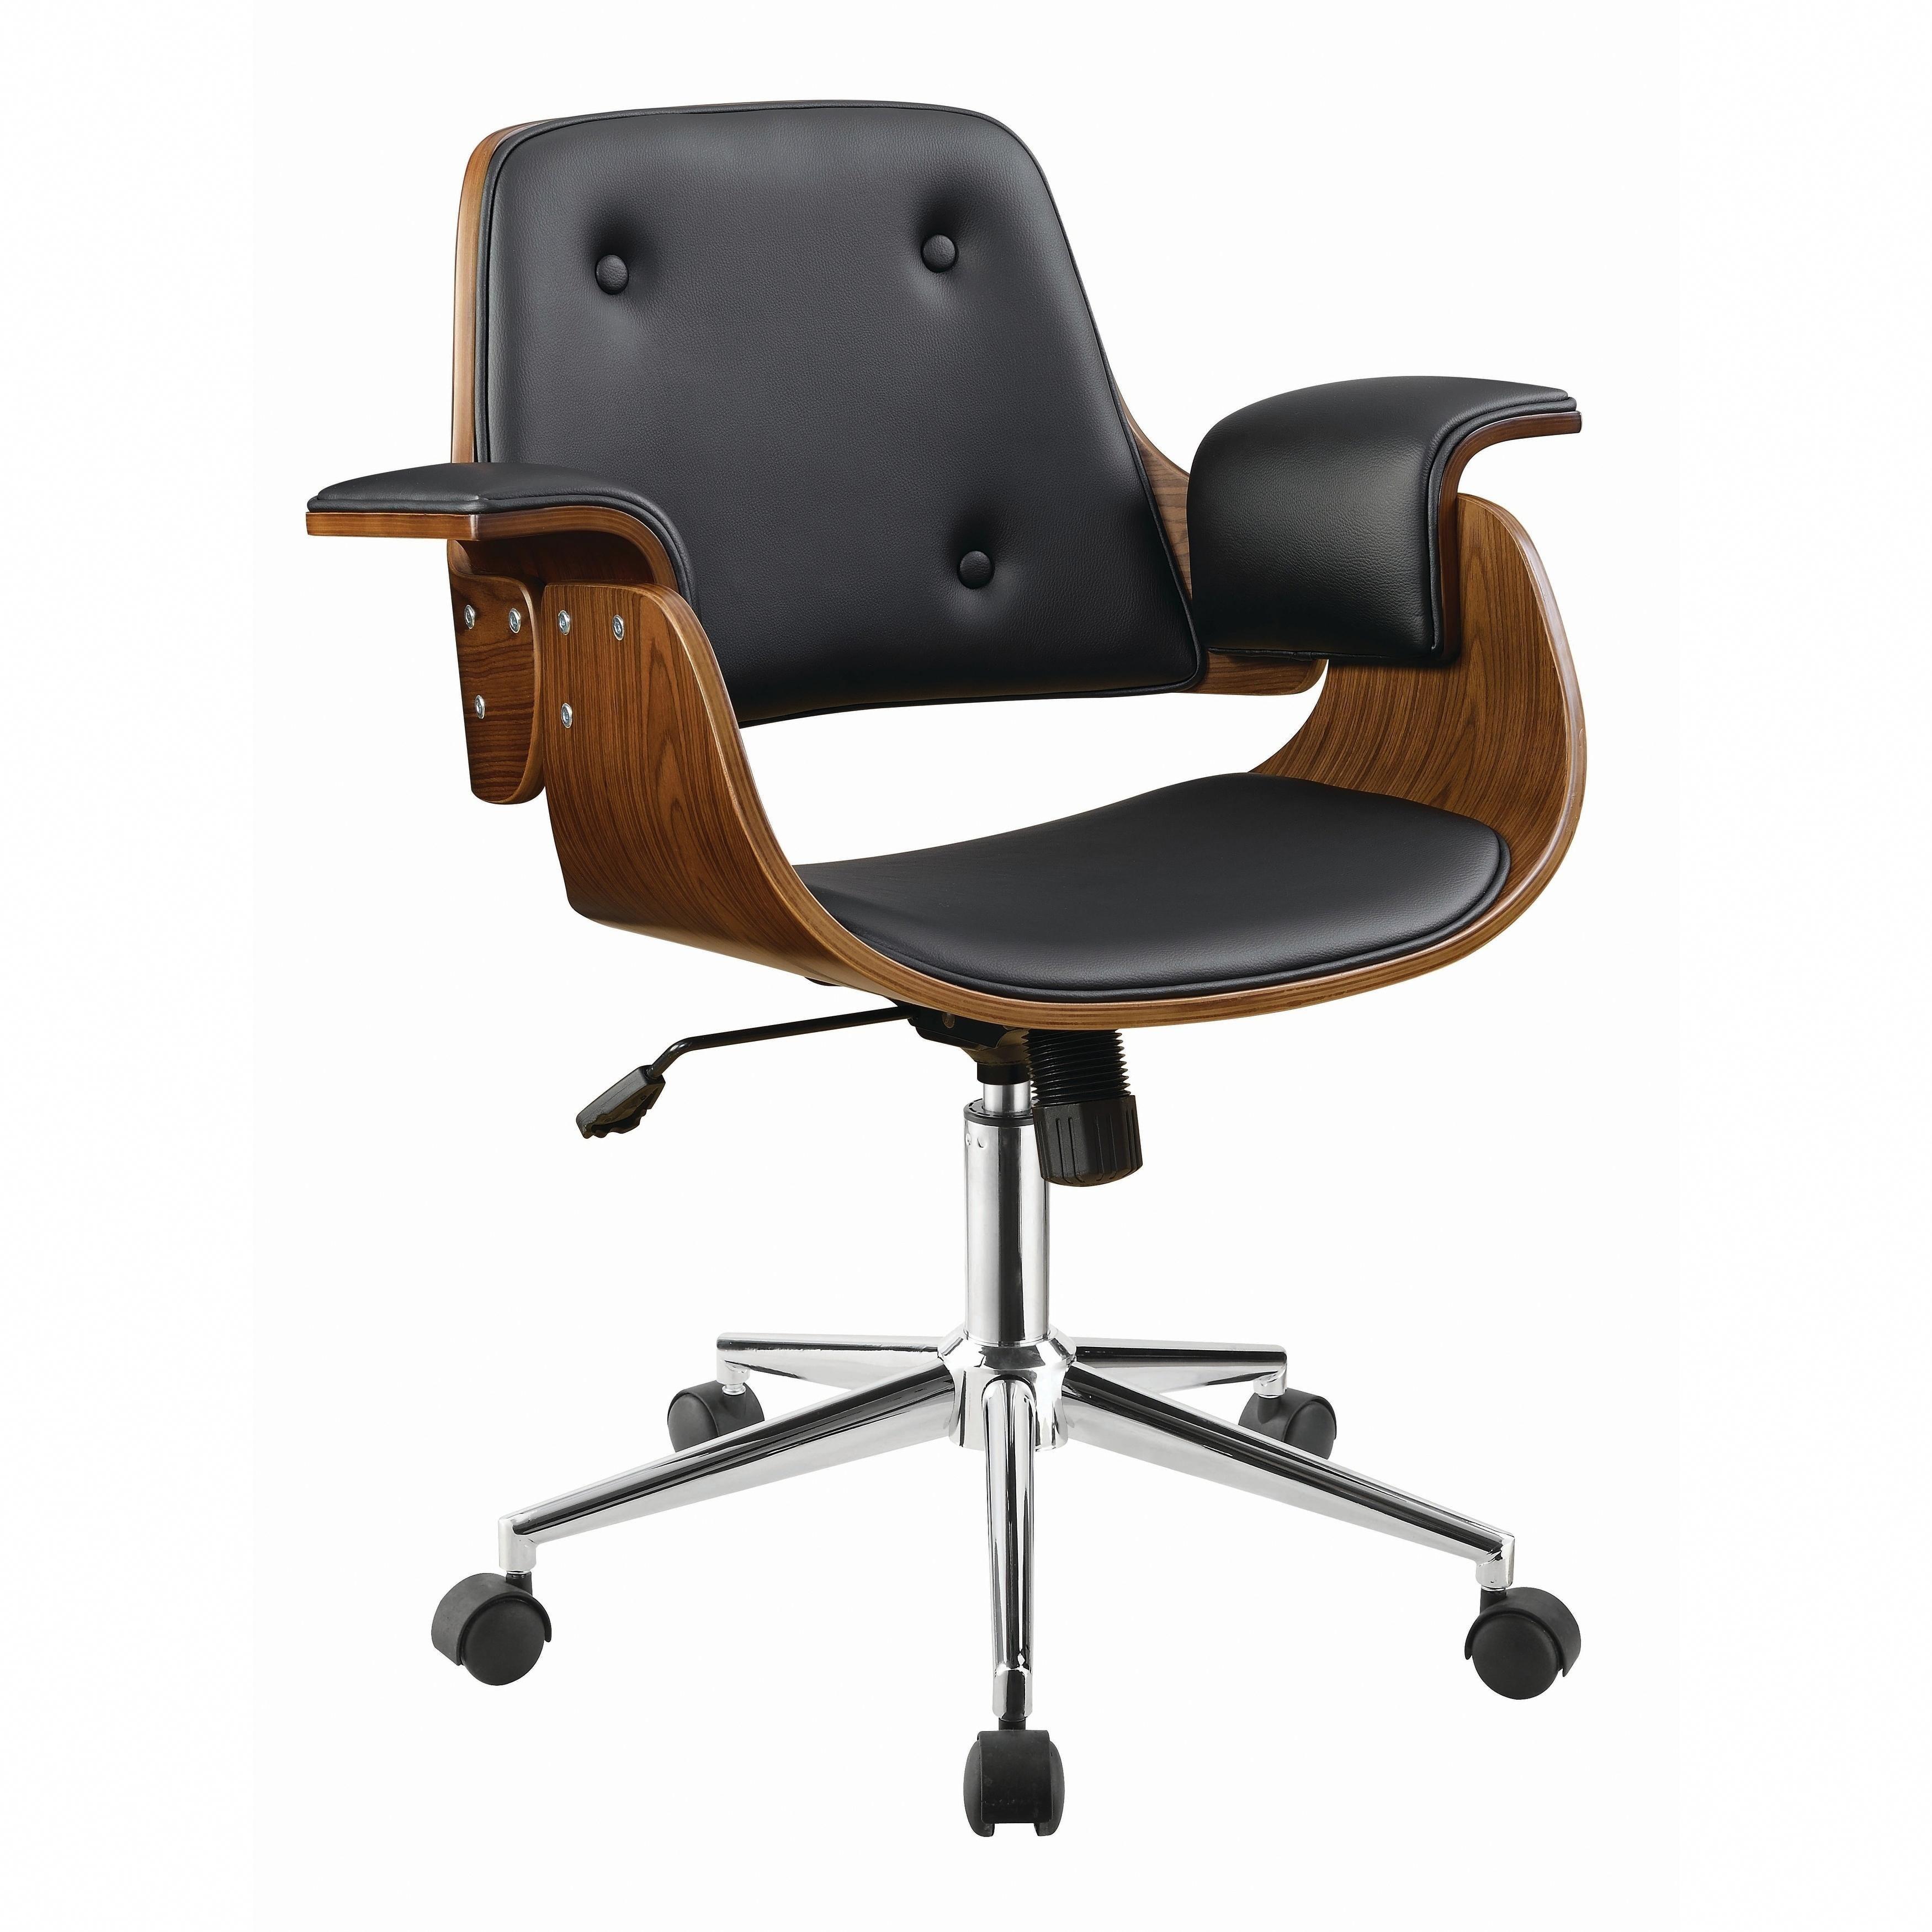 Coaster Mid Century Modern Walnut Brown Office Chair Black